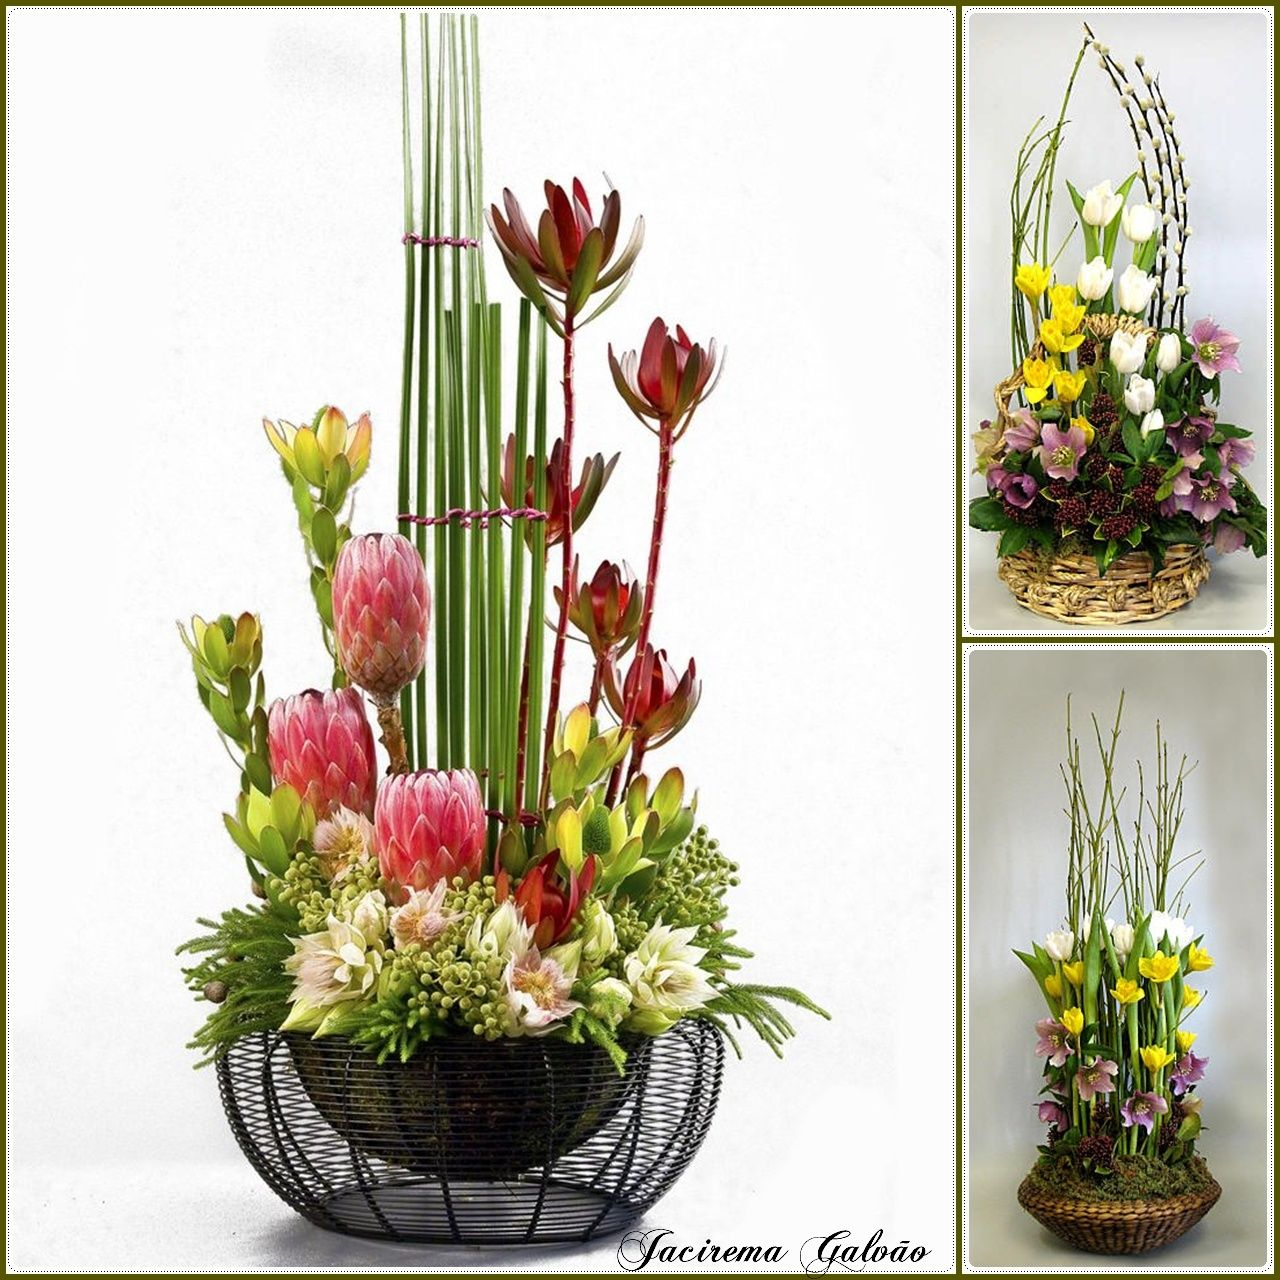 Arcadia Floral And Home Decor Arranjos Florais Arranjos Florais Pinterest Ikebana